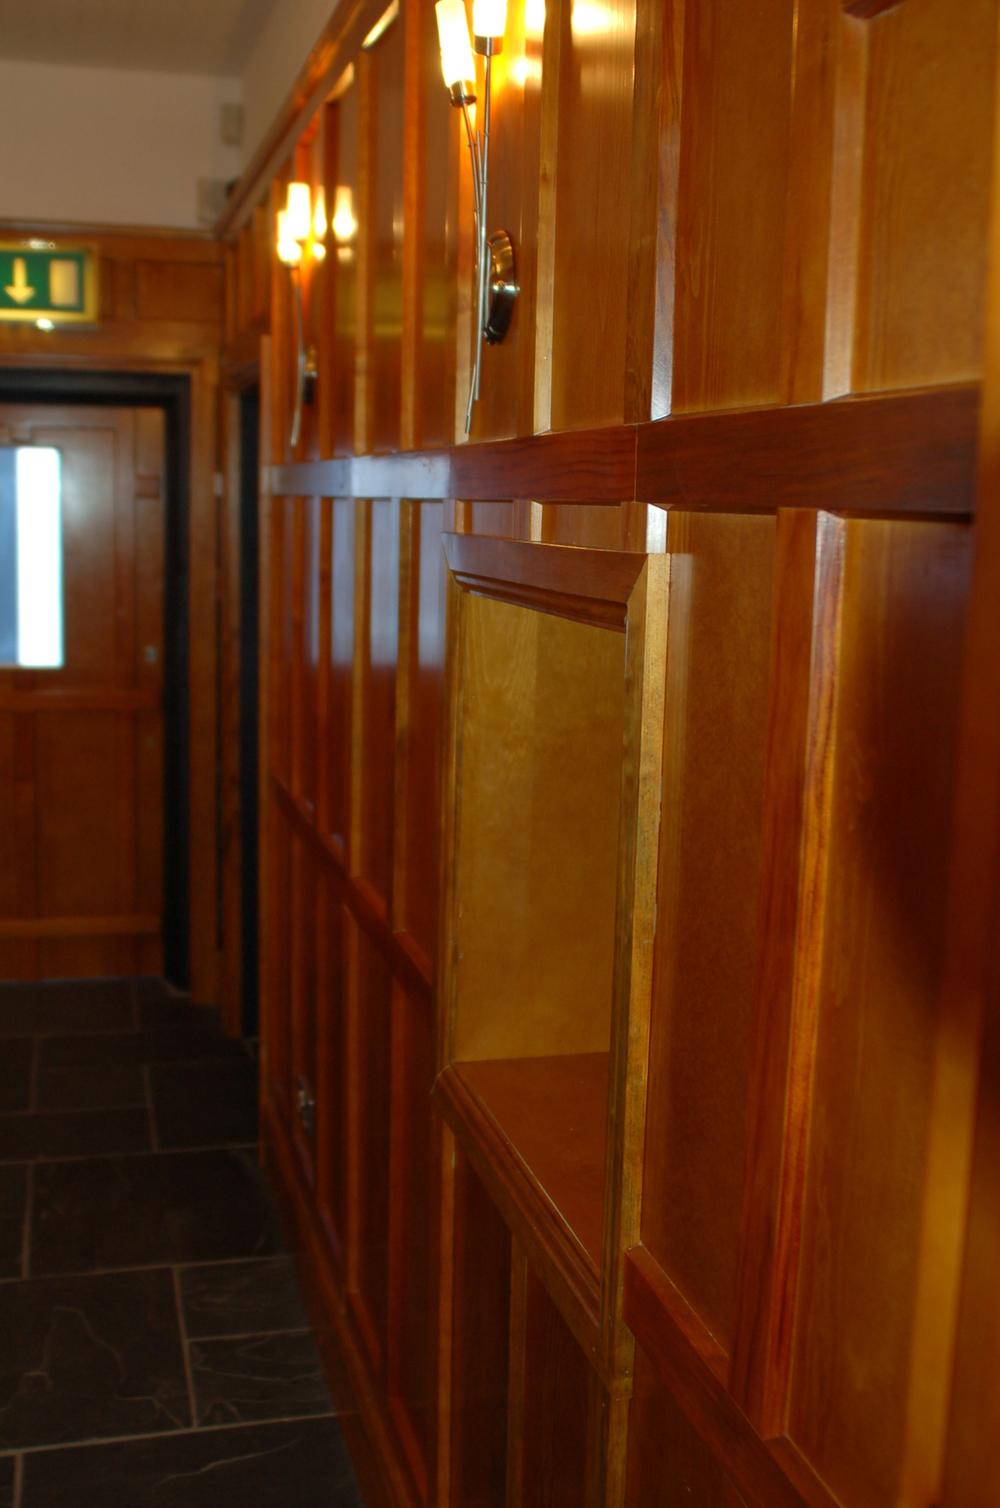 Wooden panel details